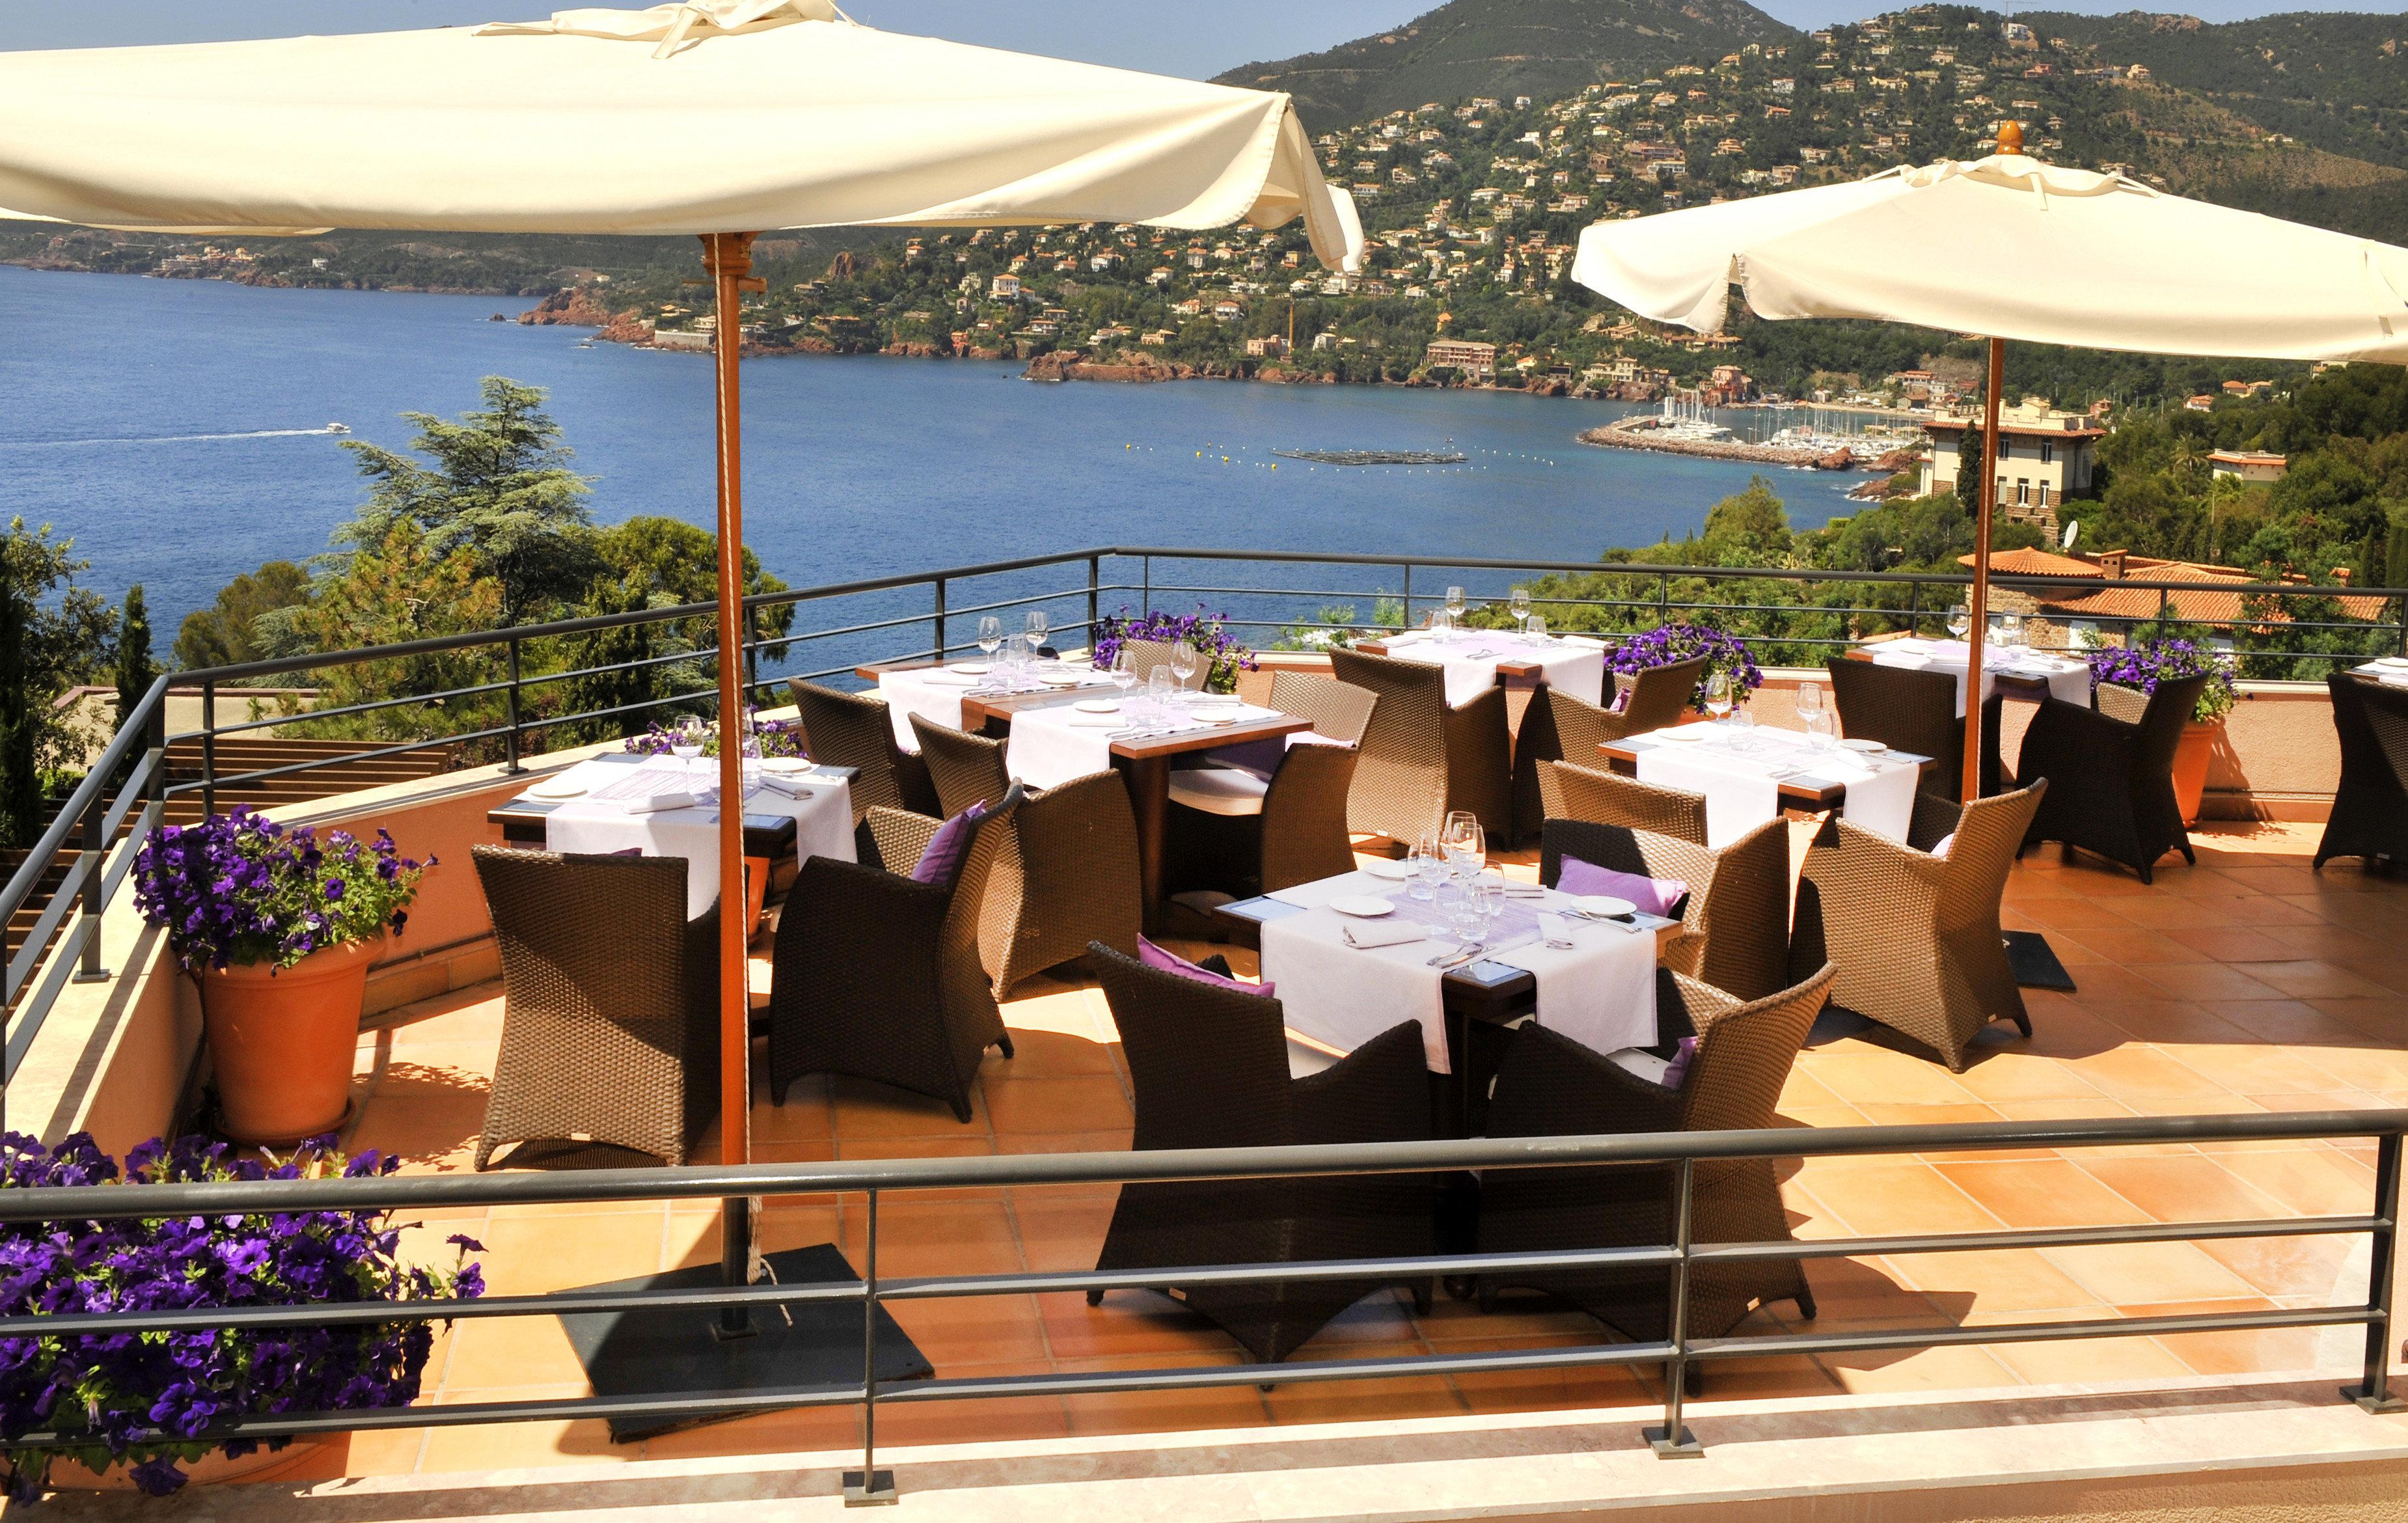 Bar Dining Drink Eat Luxury Romantic Scenic views Waterfront umbrella chair Resort restaurant set